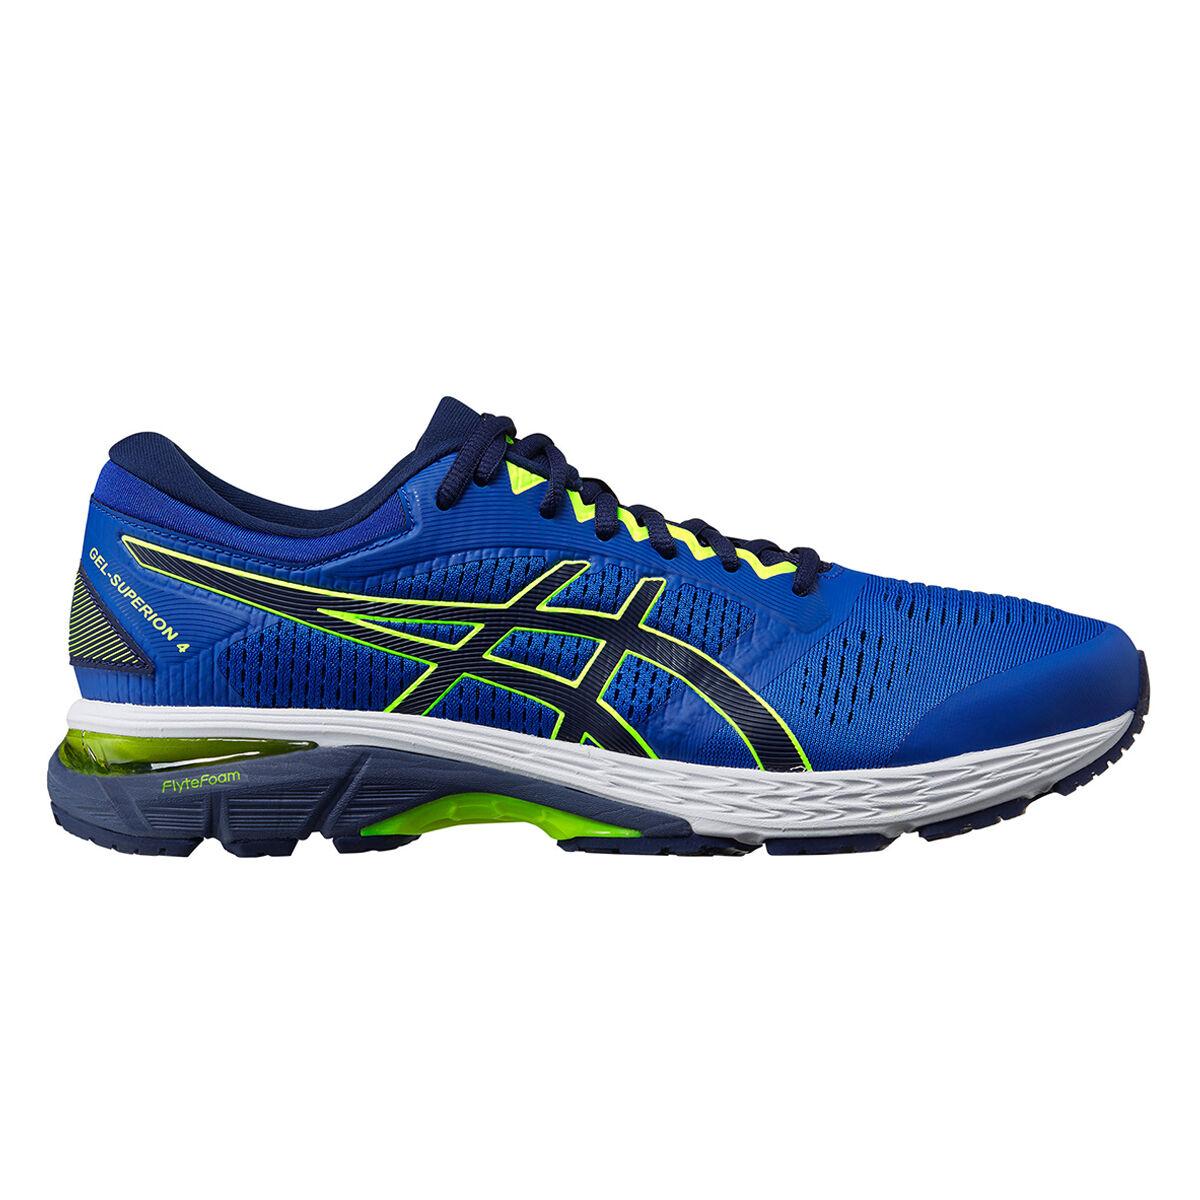 Asics GEL Superion 4 Mens Running Shoes   Gov Sport